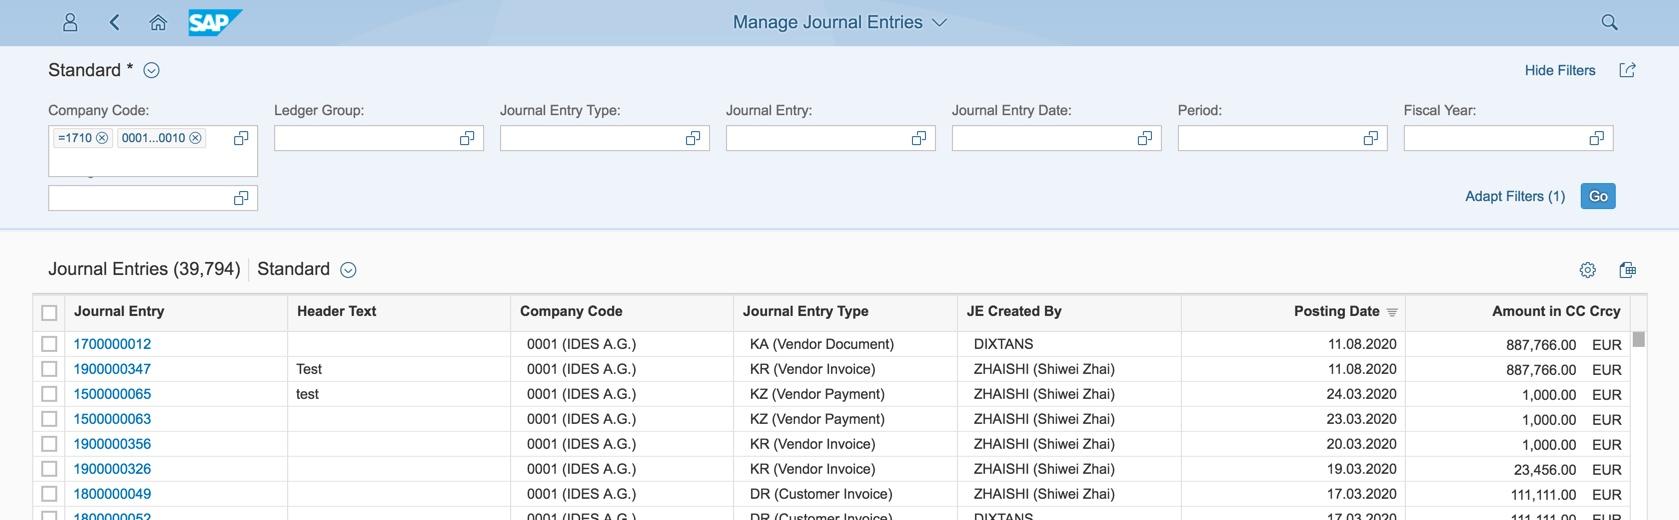 Setting User Defaults in SAP S/4HANA | SAP Blogs